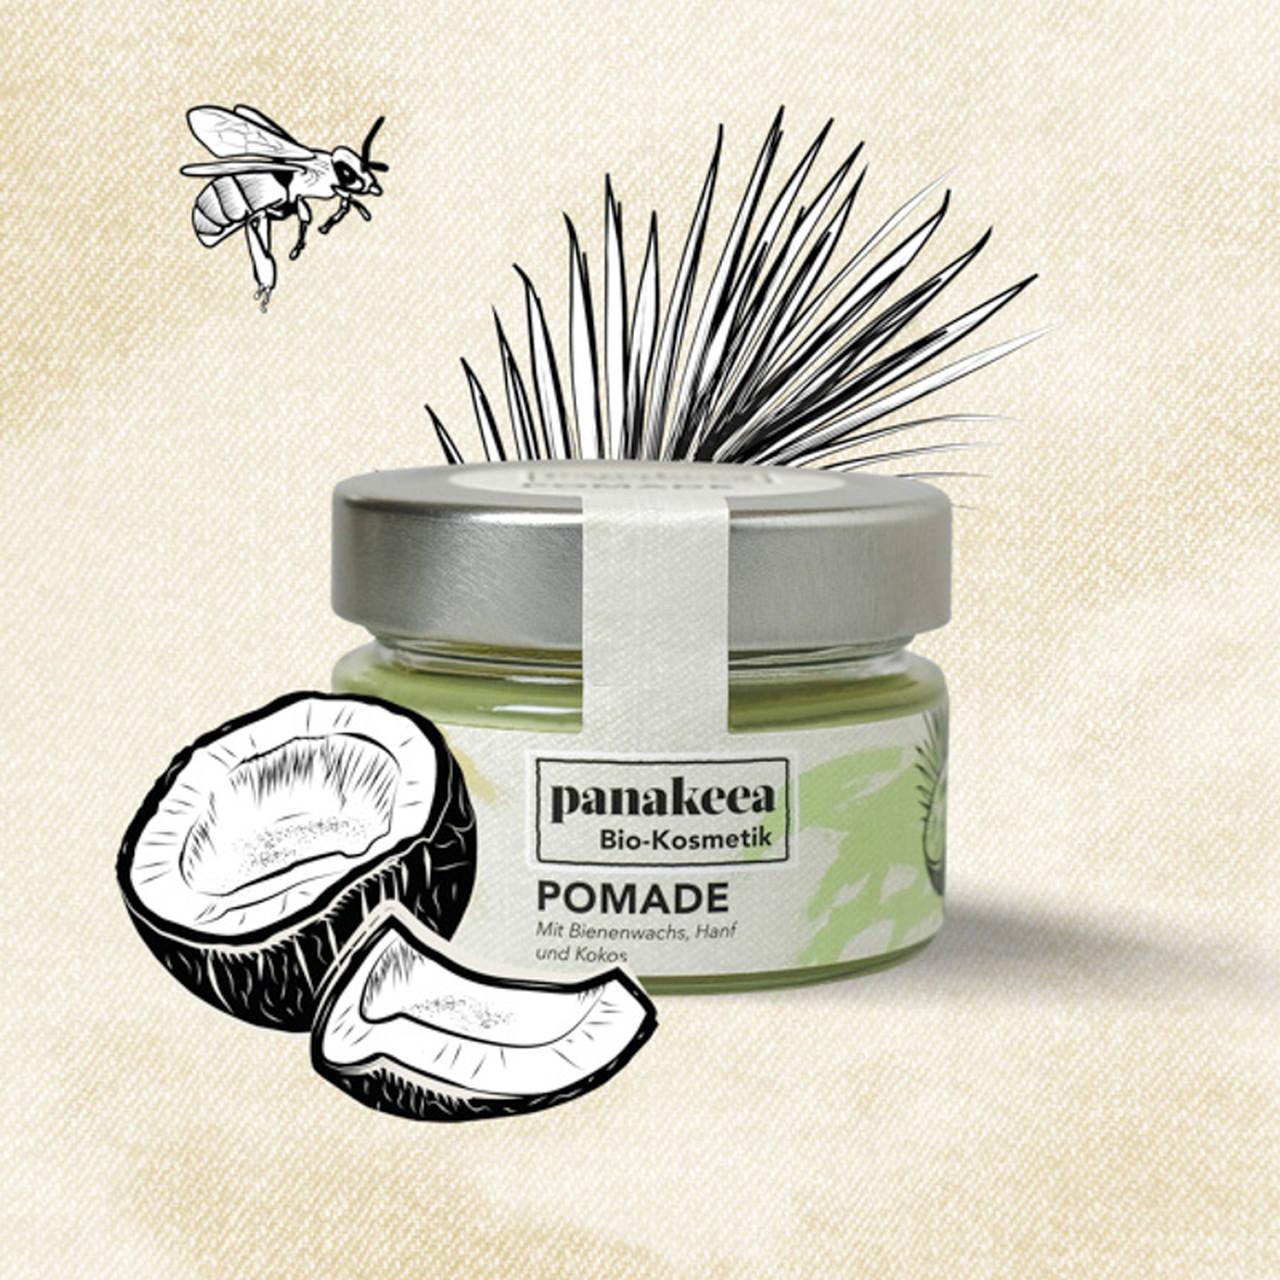 Biopomade von Panakeea